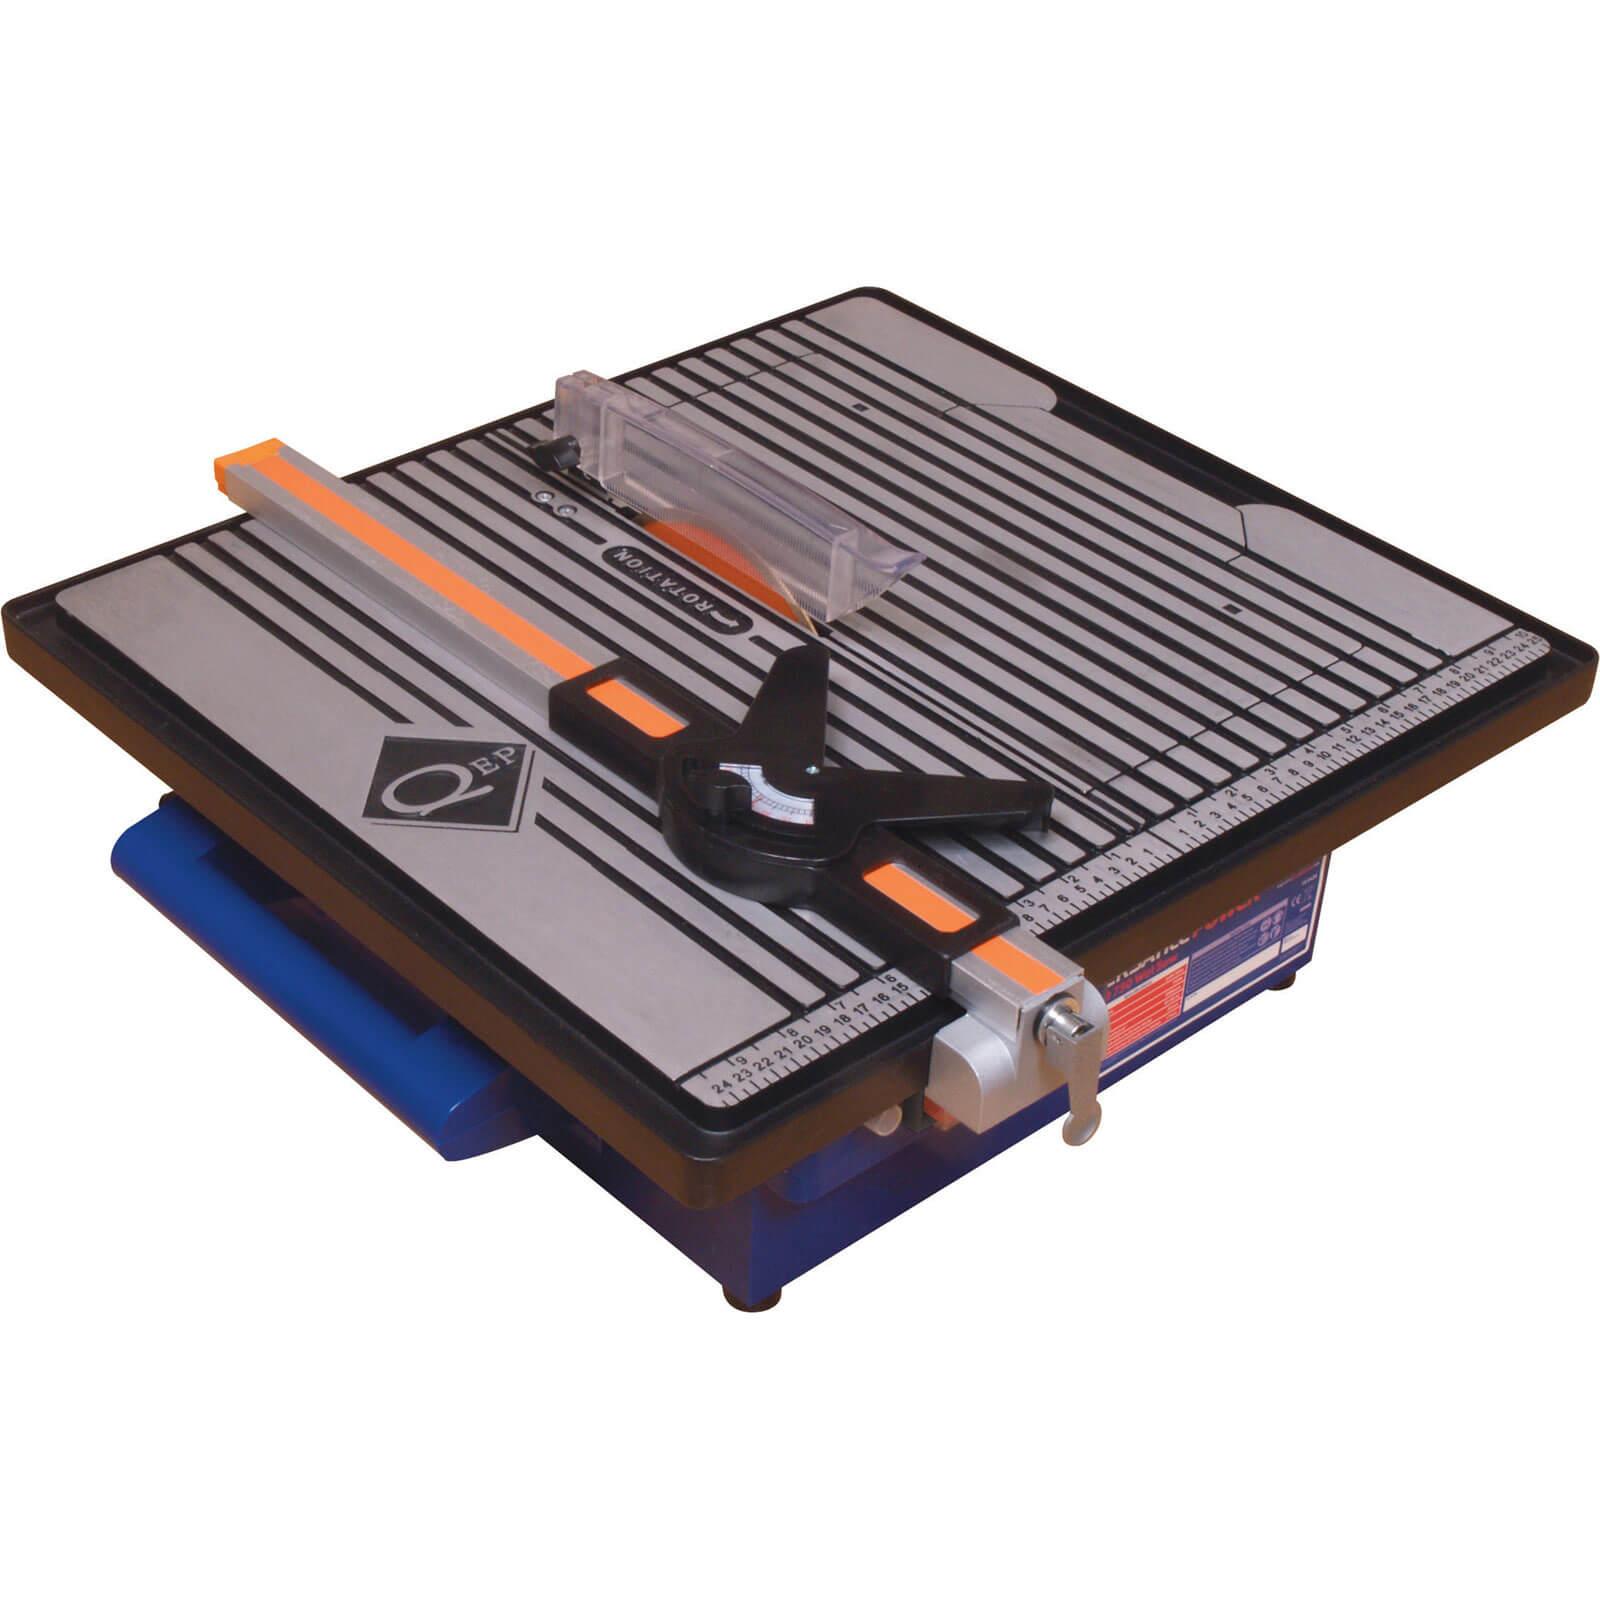 Vitrex Versatile Power Pro 750 Wet Tile Saw 180mm Diamond Blade 750w 110v